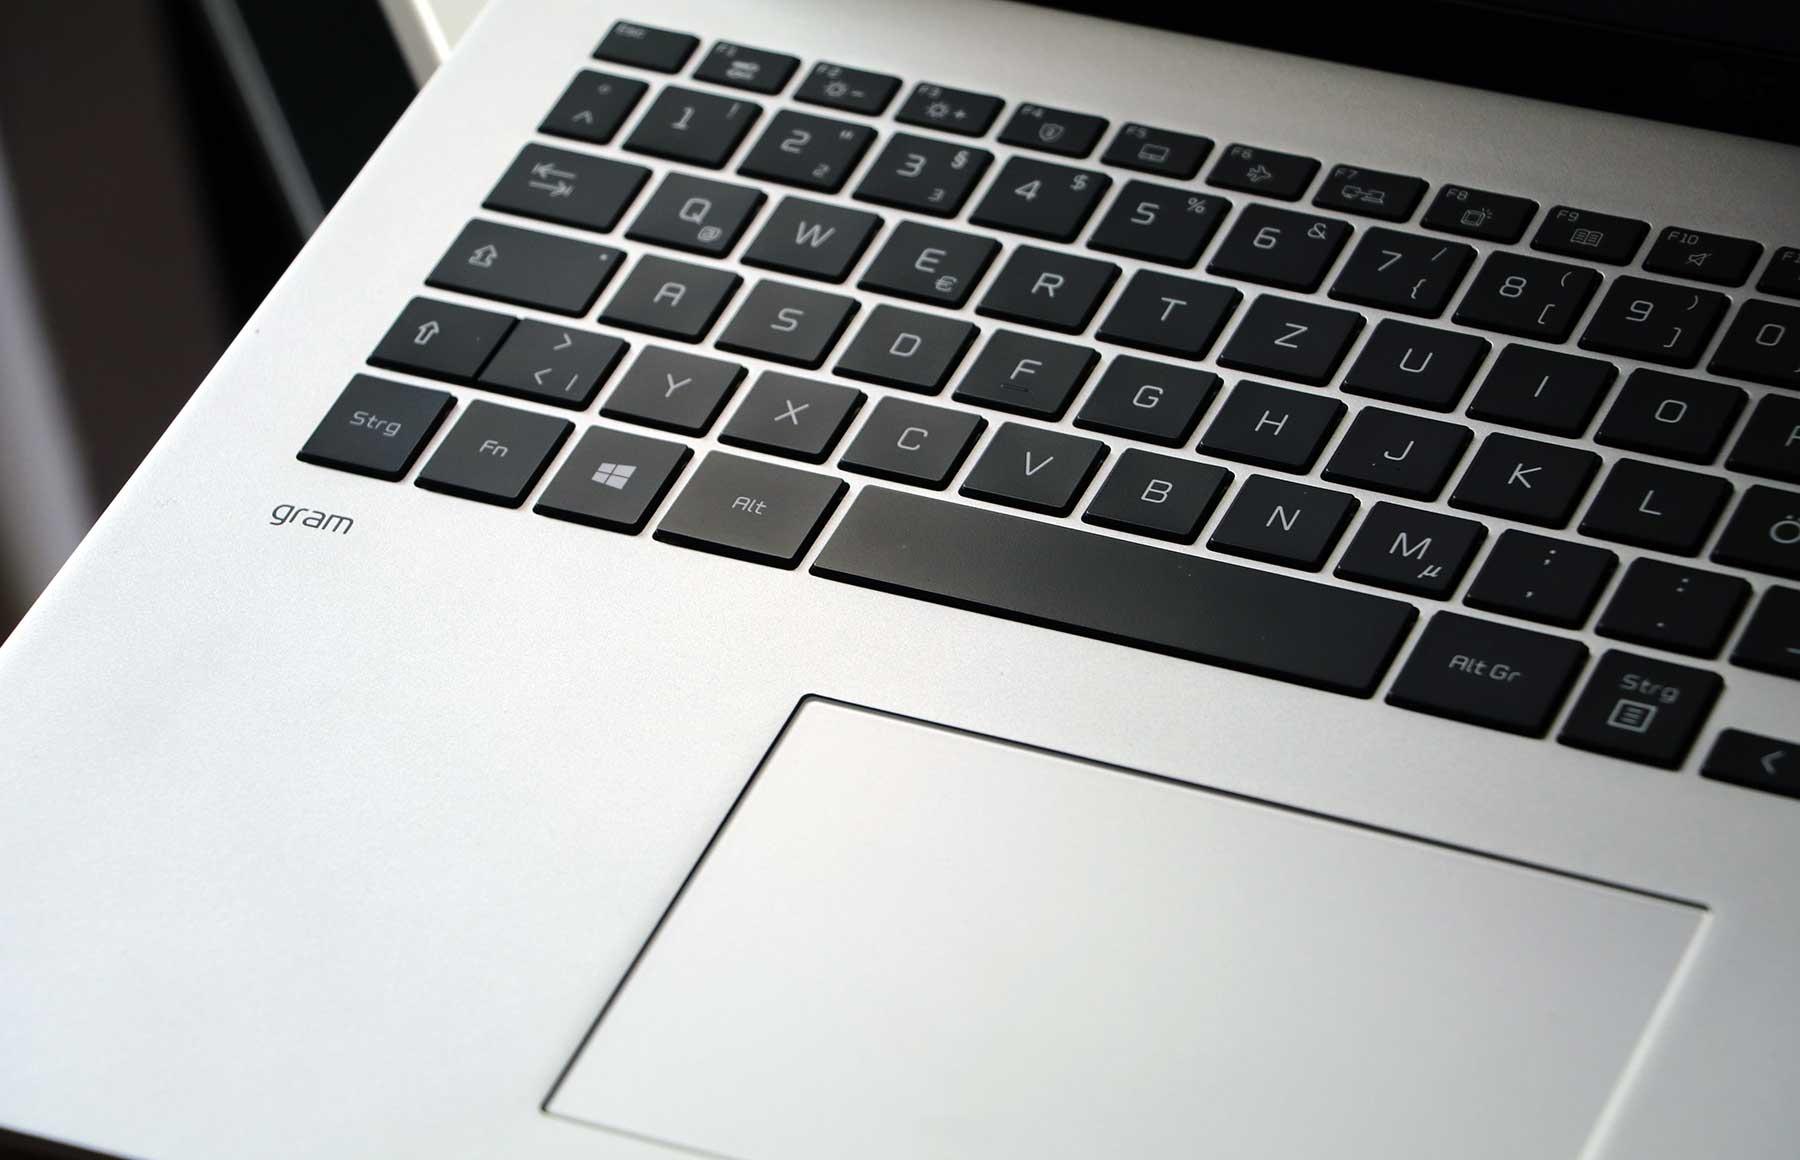 Laptop-Testbericht: Neues LG gram 17-Zoll-Notebook (2021er Version) LG-gram-17_2021_Testbericht_14